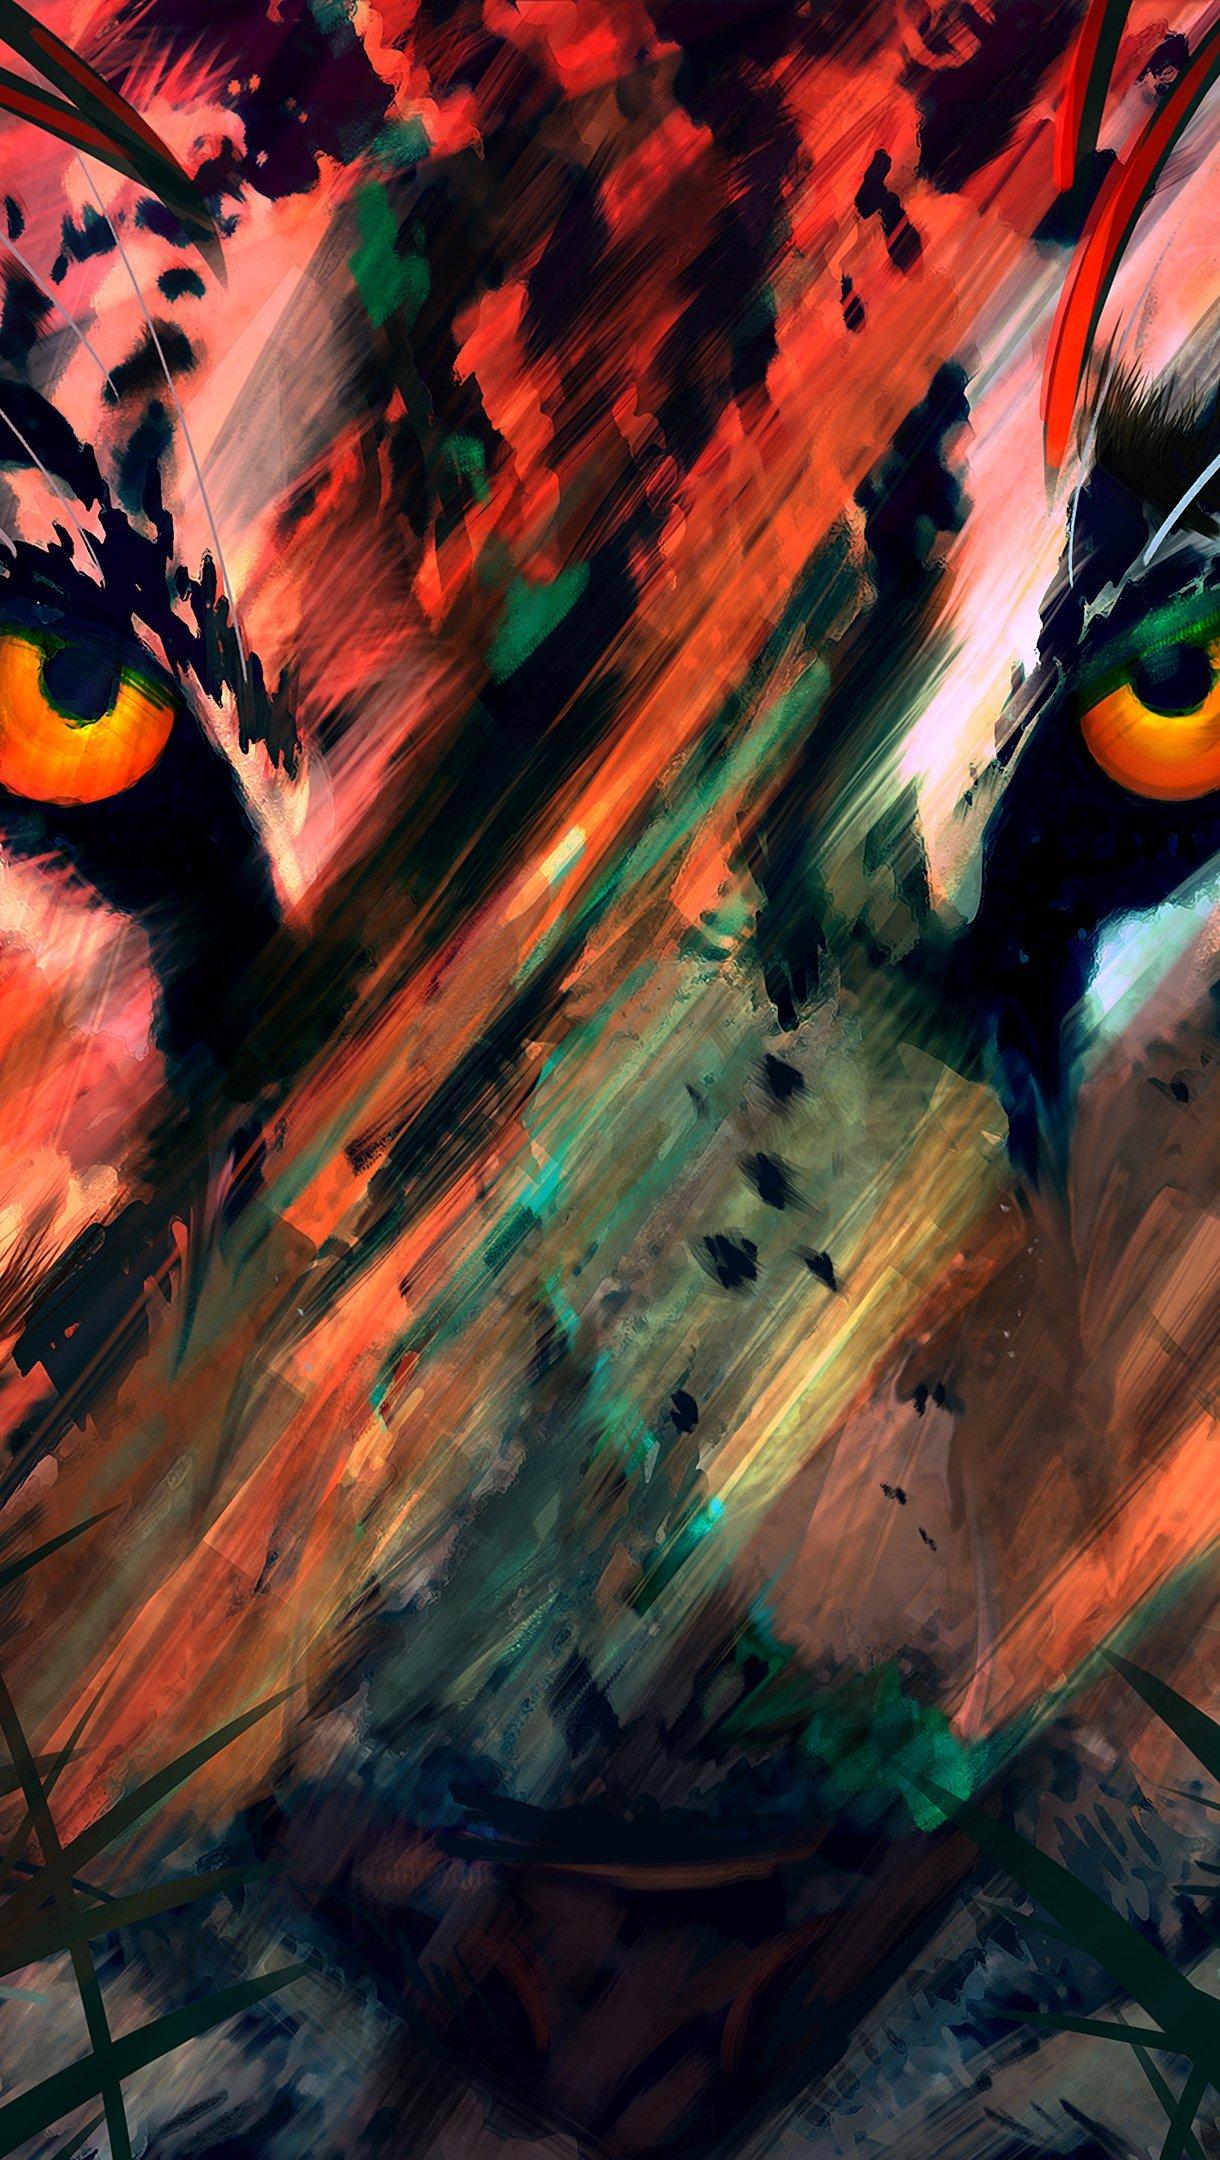 Fondos de pantalla Arte digital de tigre Vertical